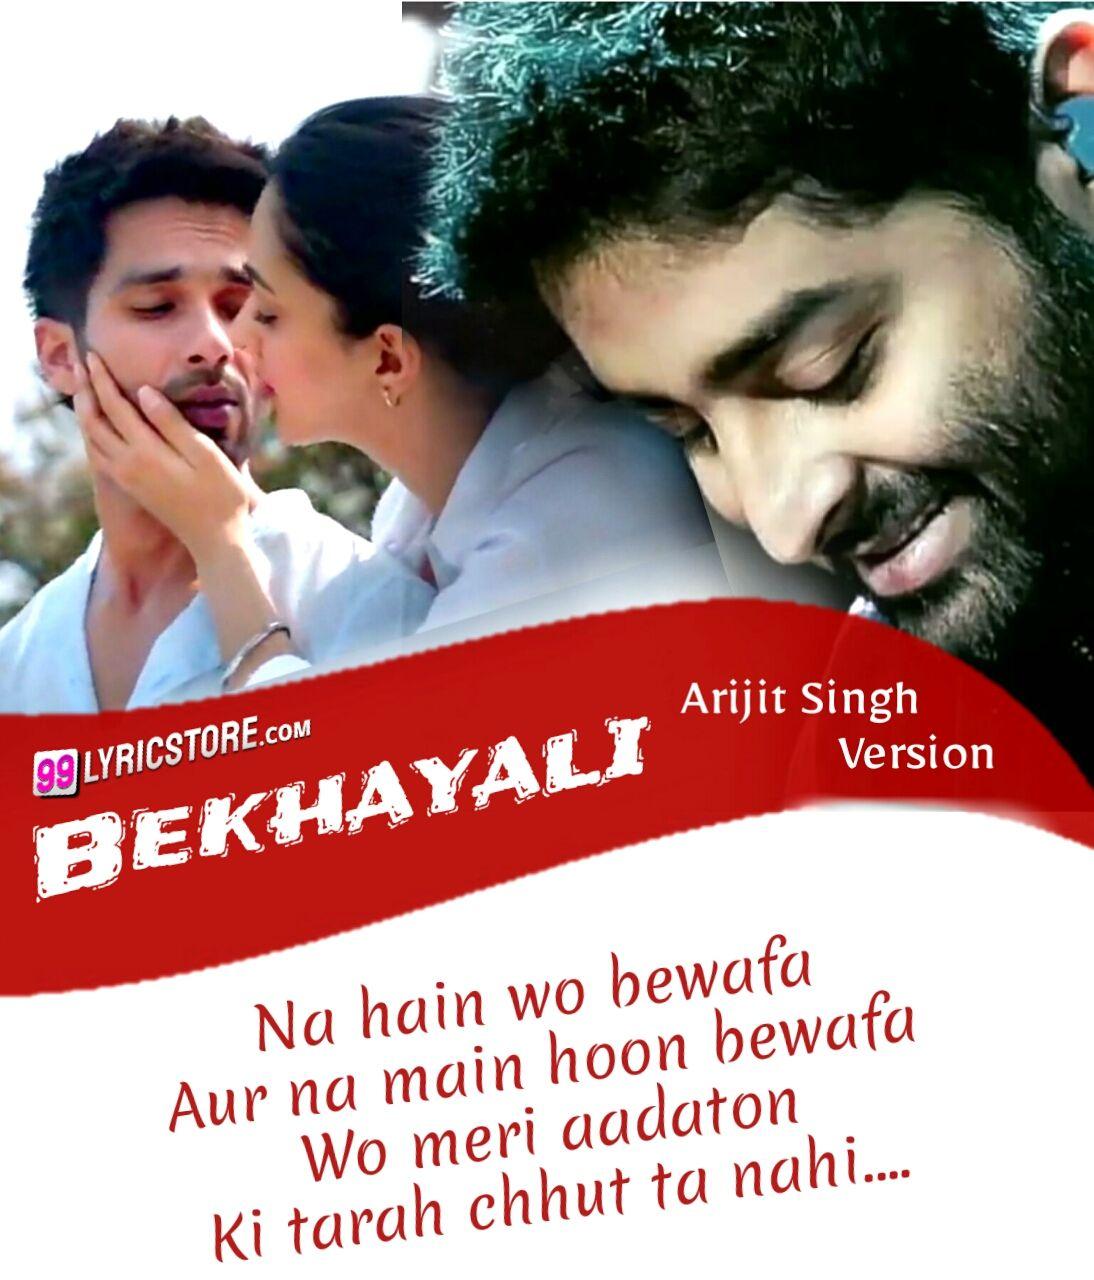 Bekhayali Arijit Singh Version Lyrics From Movie Kabir Singh